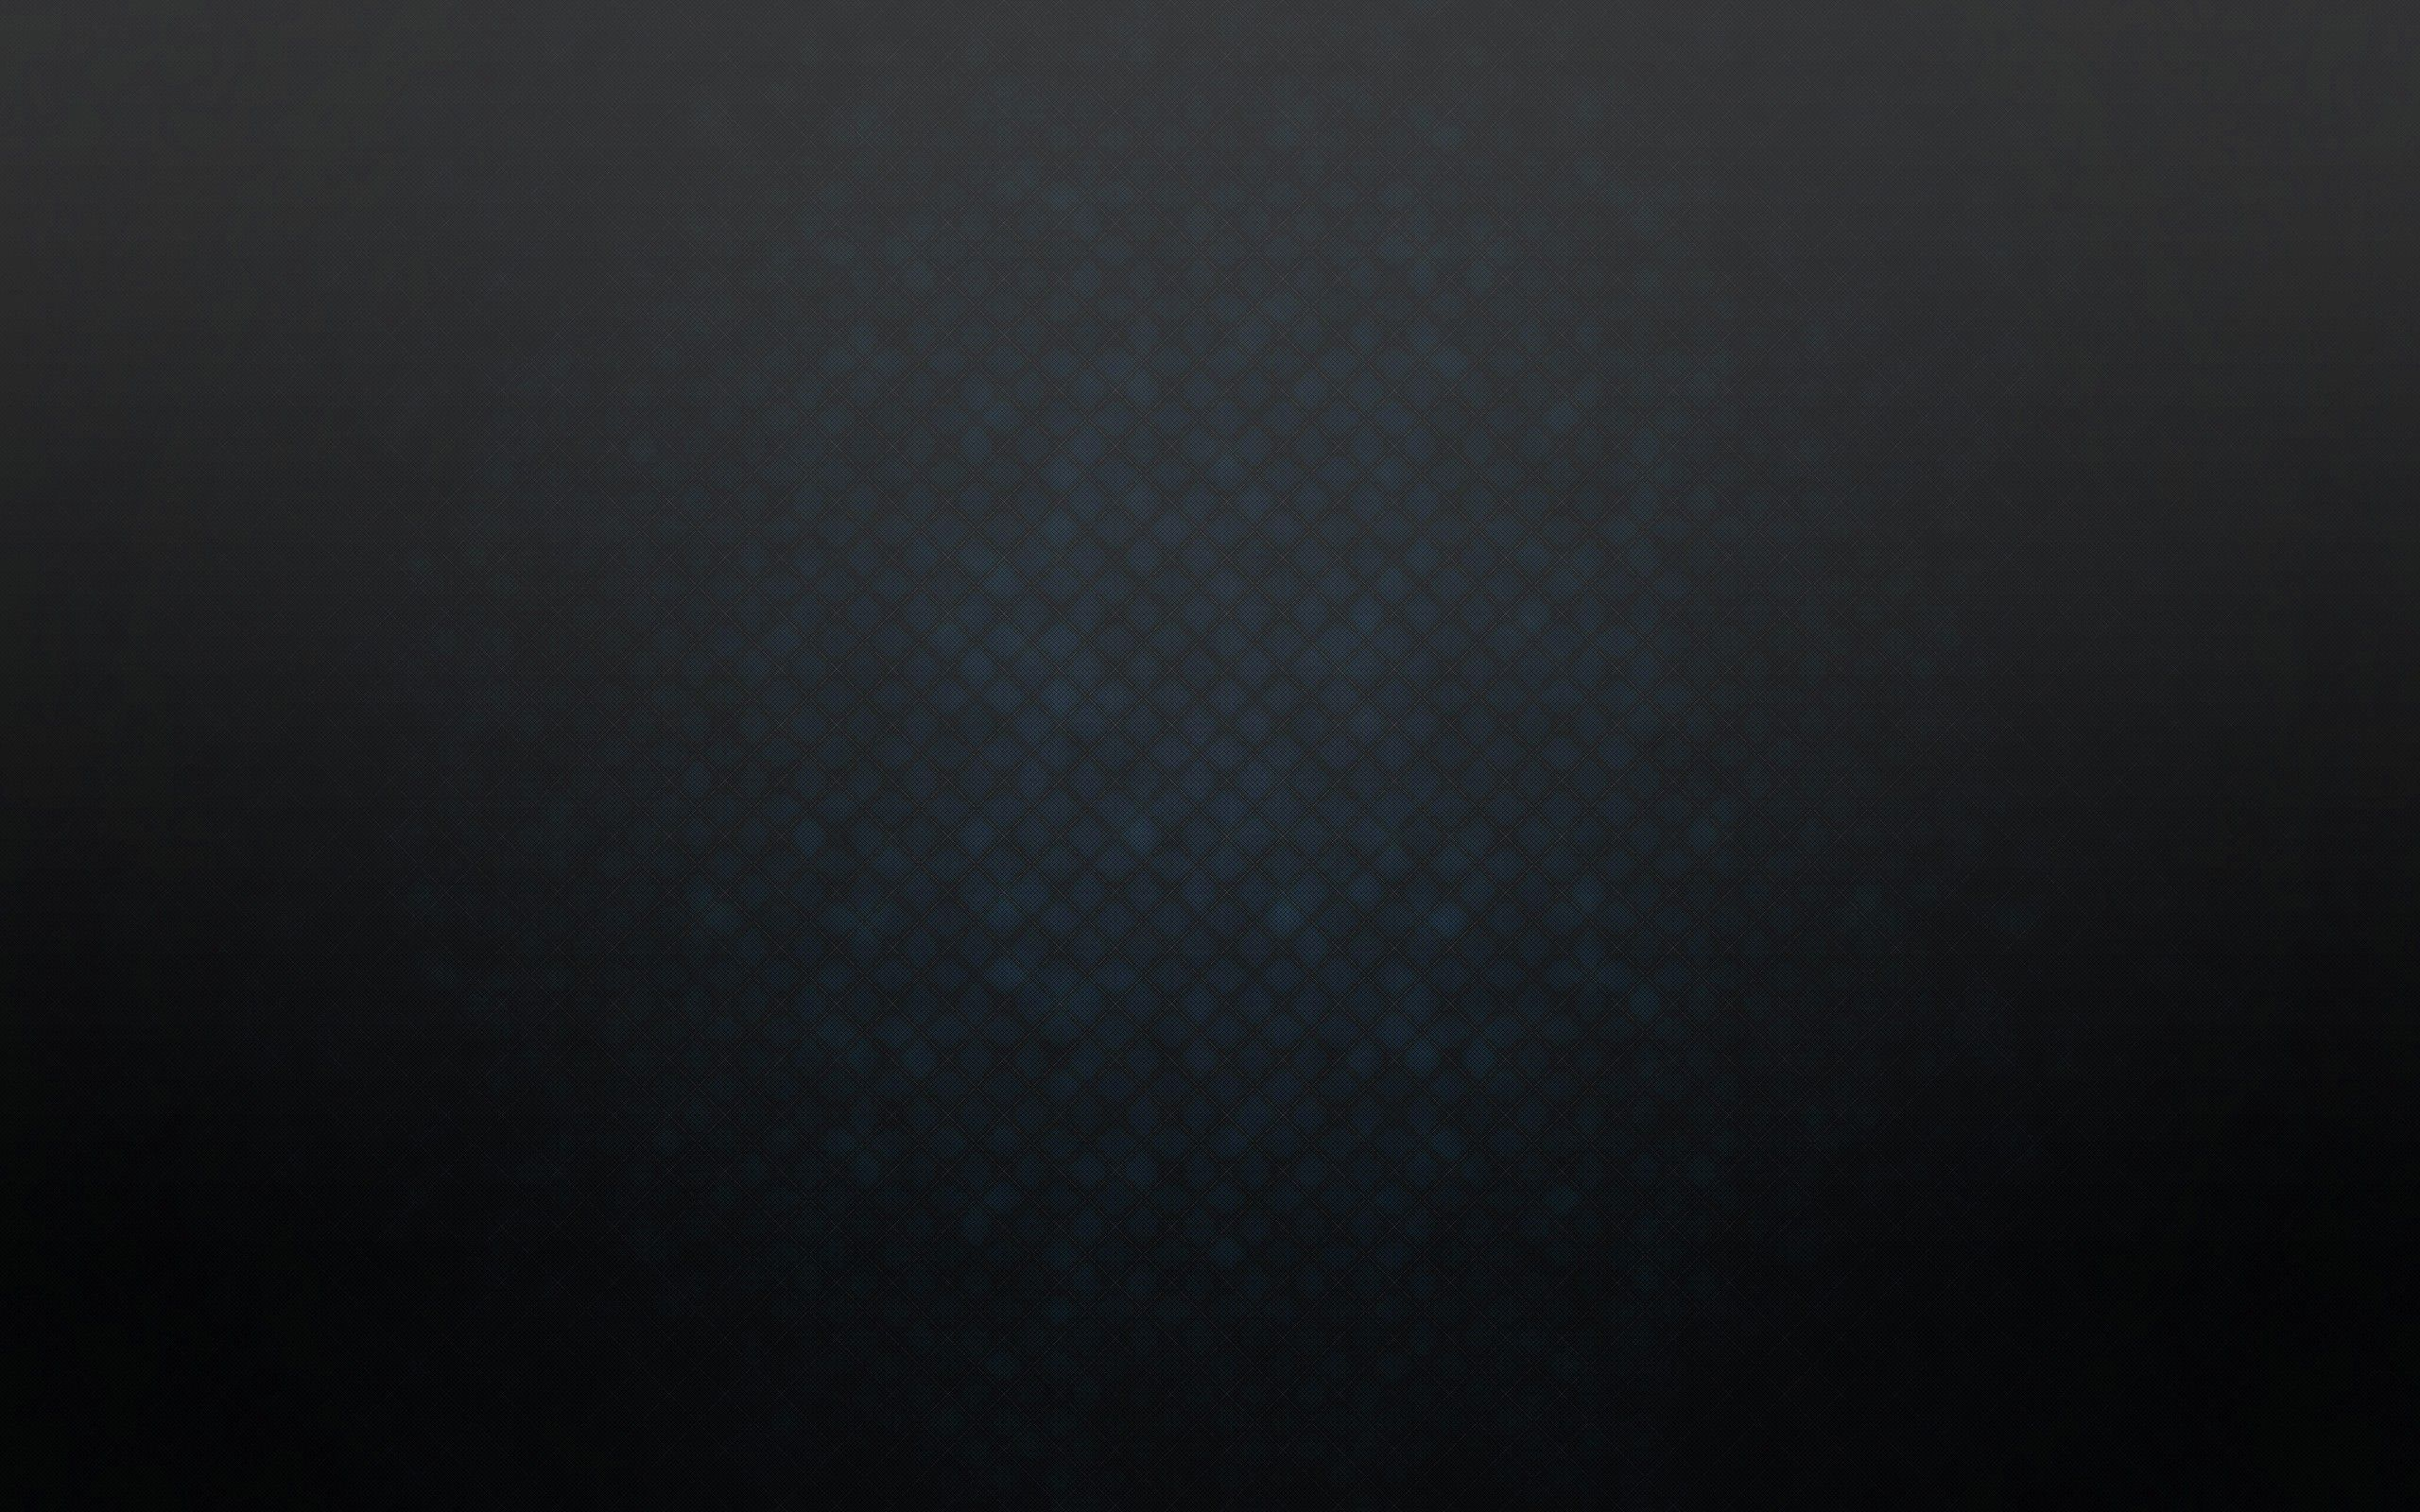 General 2560x1600 Dark Dark Gray Texture Pattern Black Upholstery Laminate Sheets Vinyl Tile